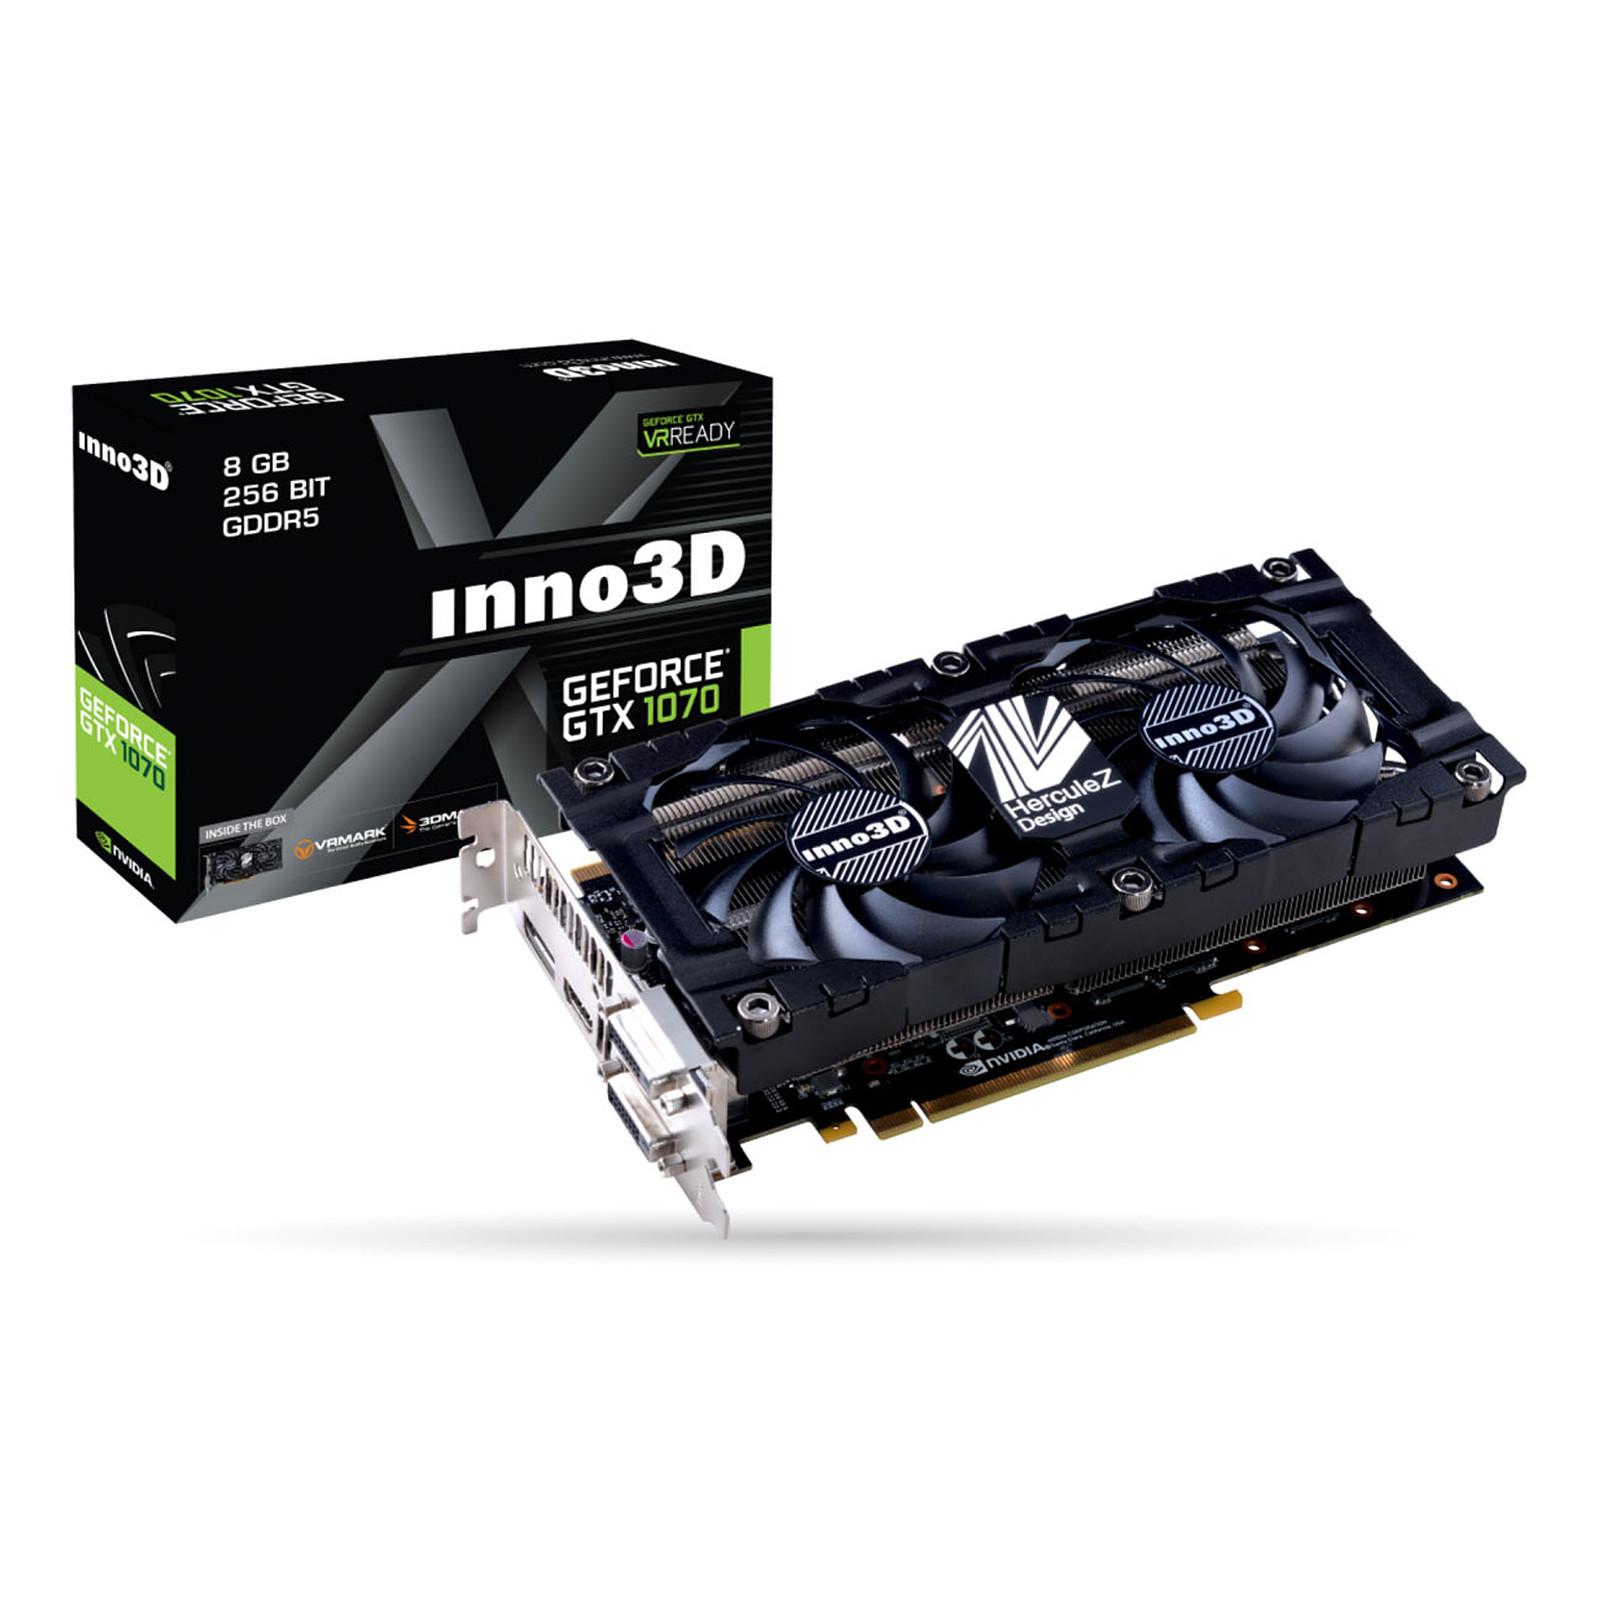 INNO3D GeForce GTX 1070 X2 V4